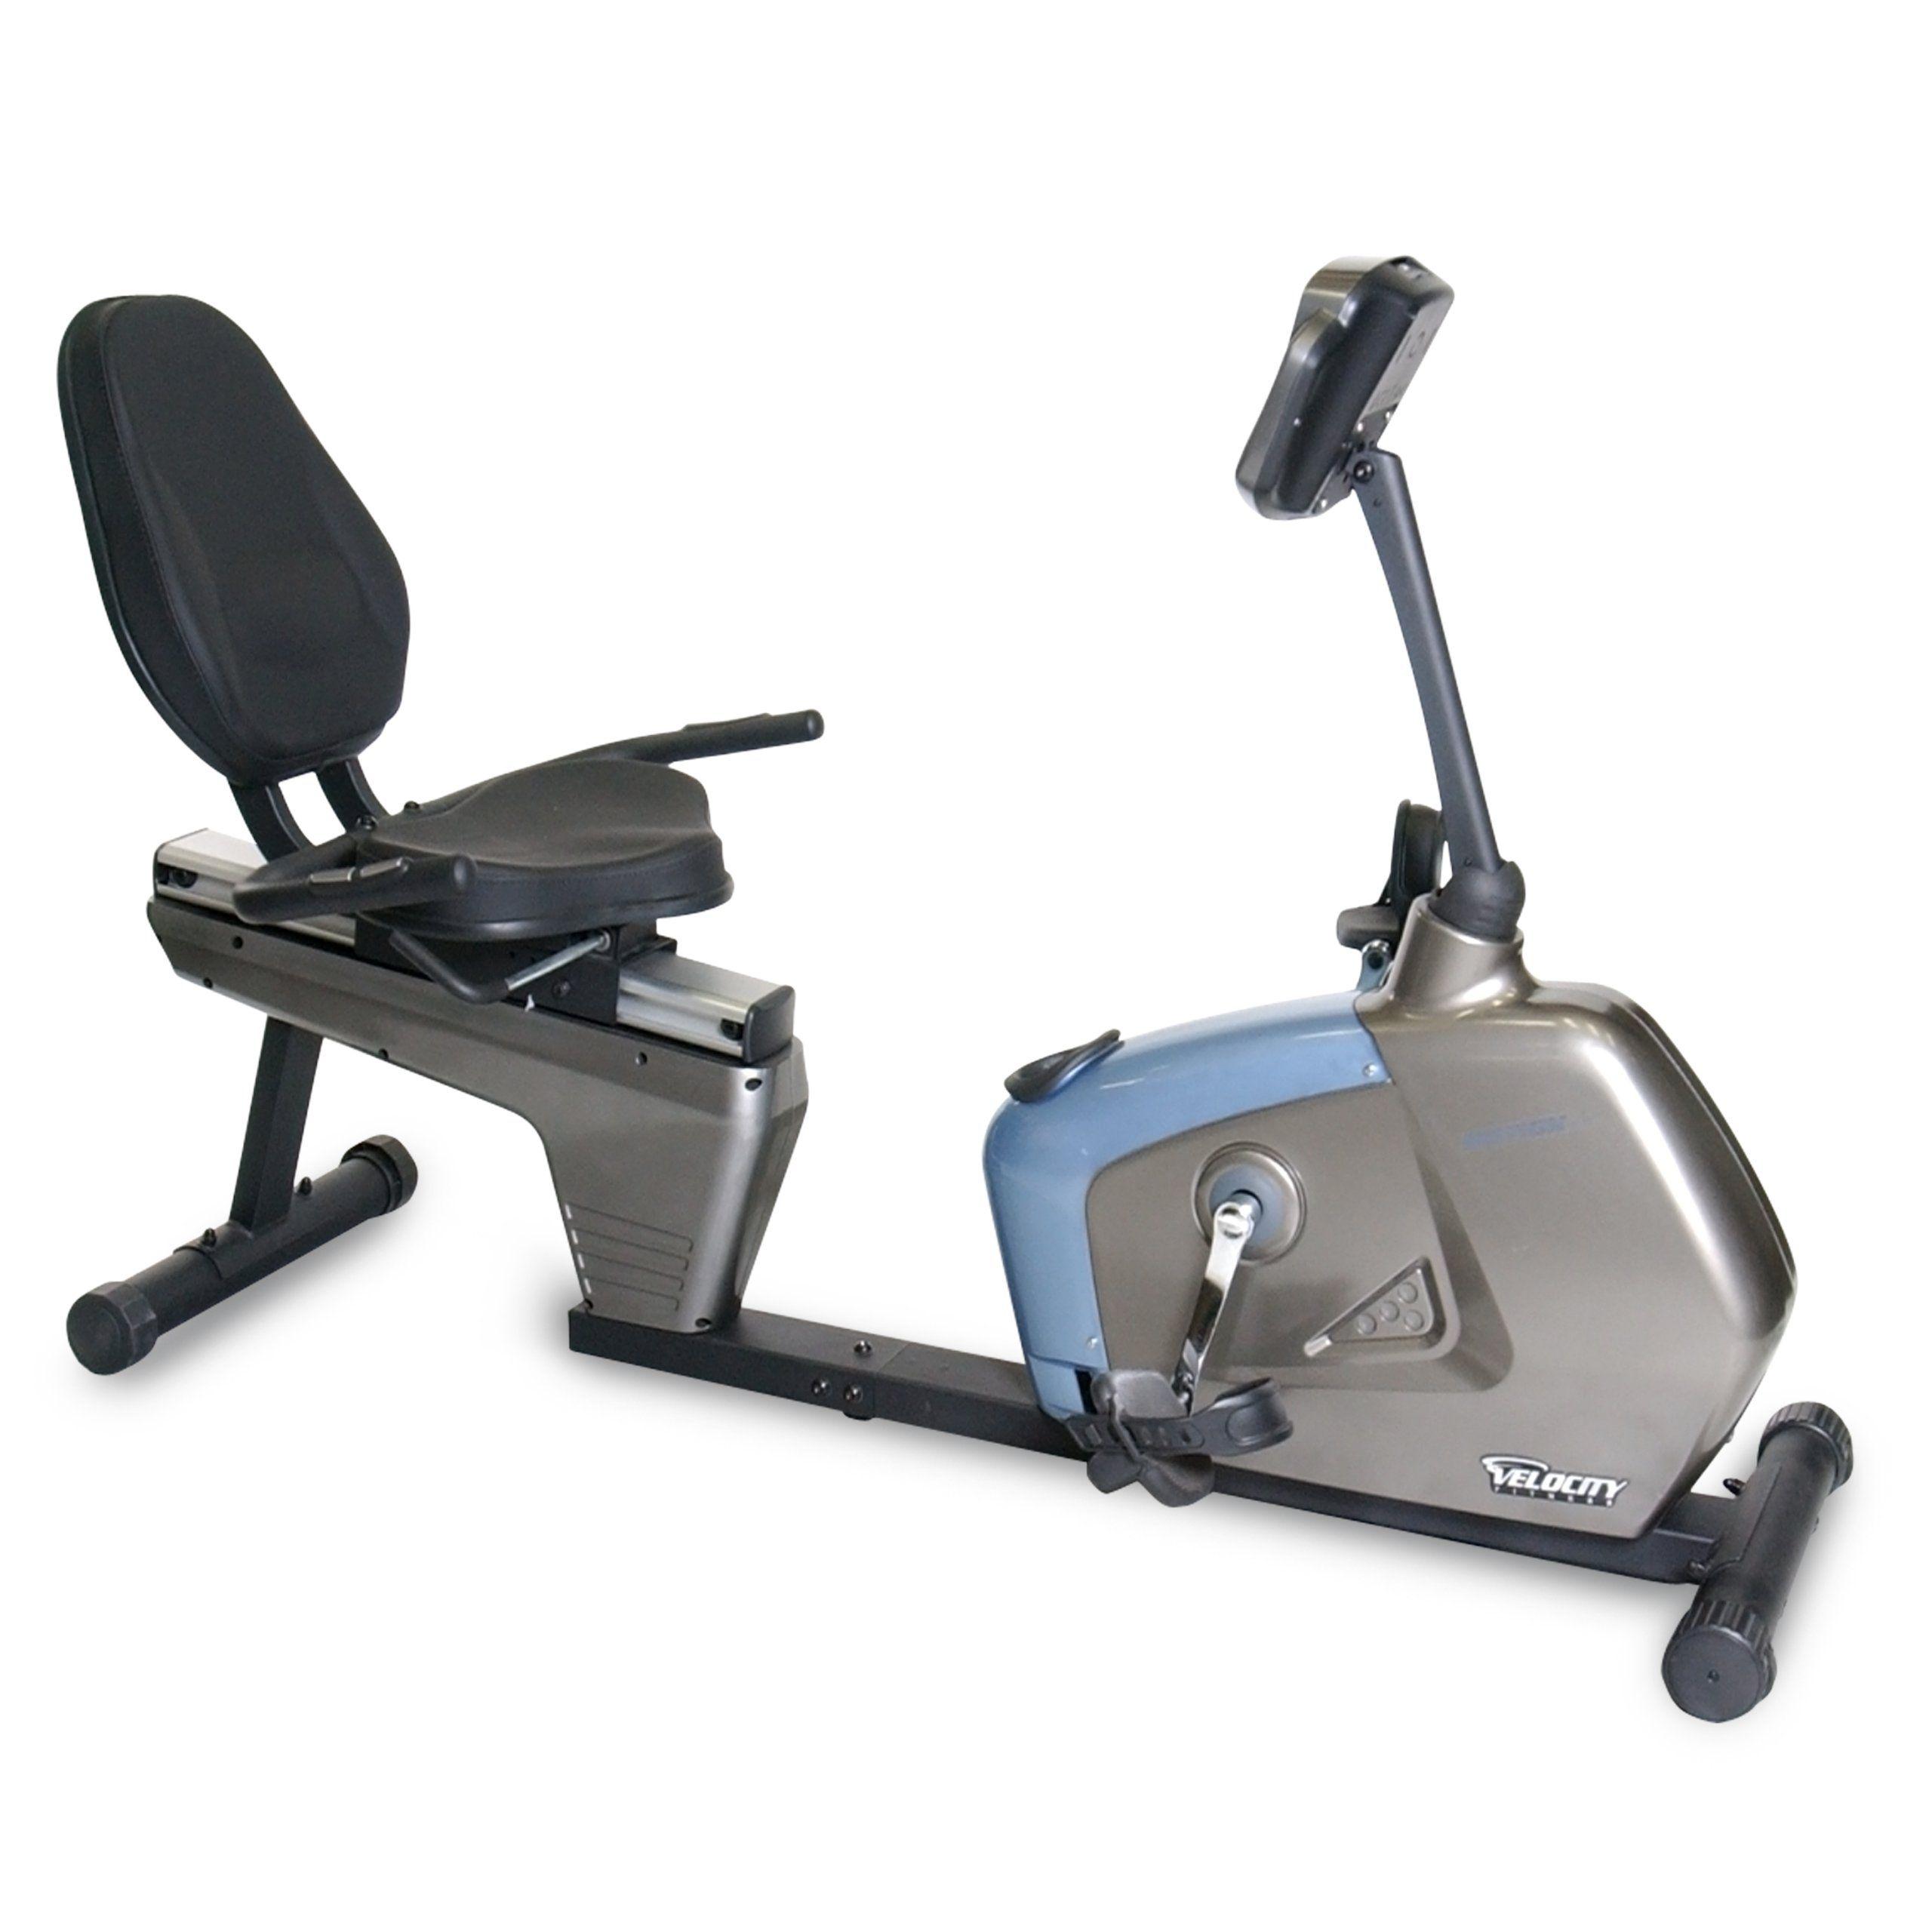 Velocity Exercise Recumbent Exercise Bike Click image